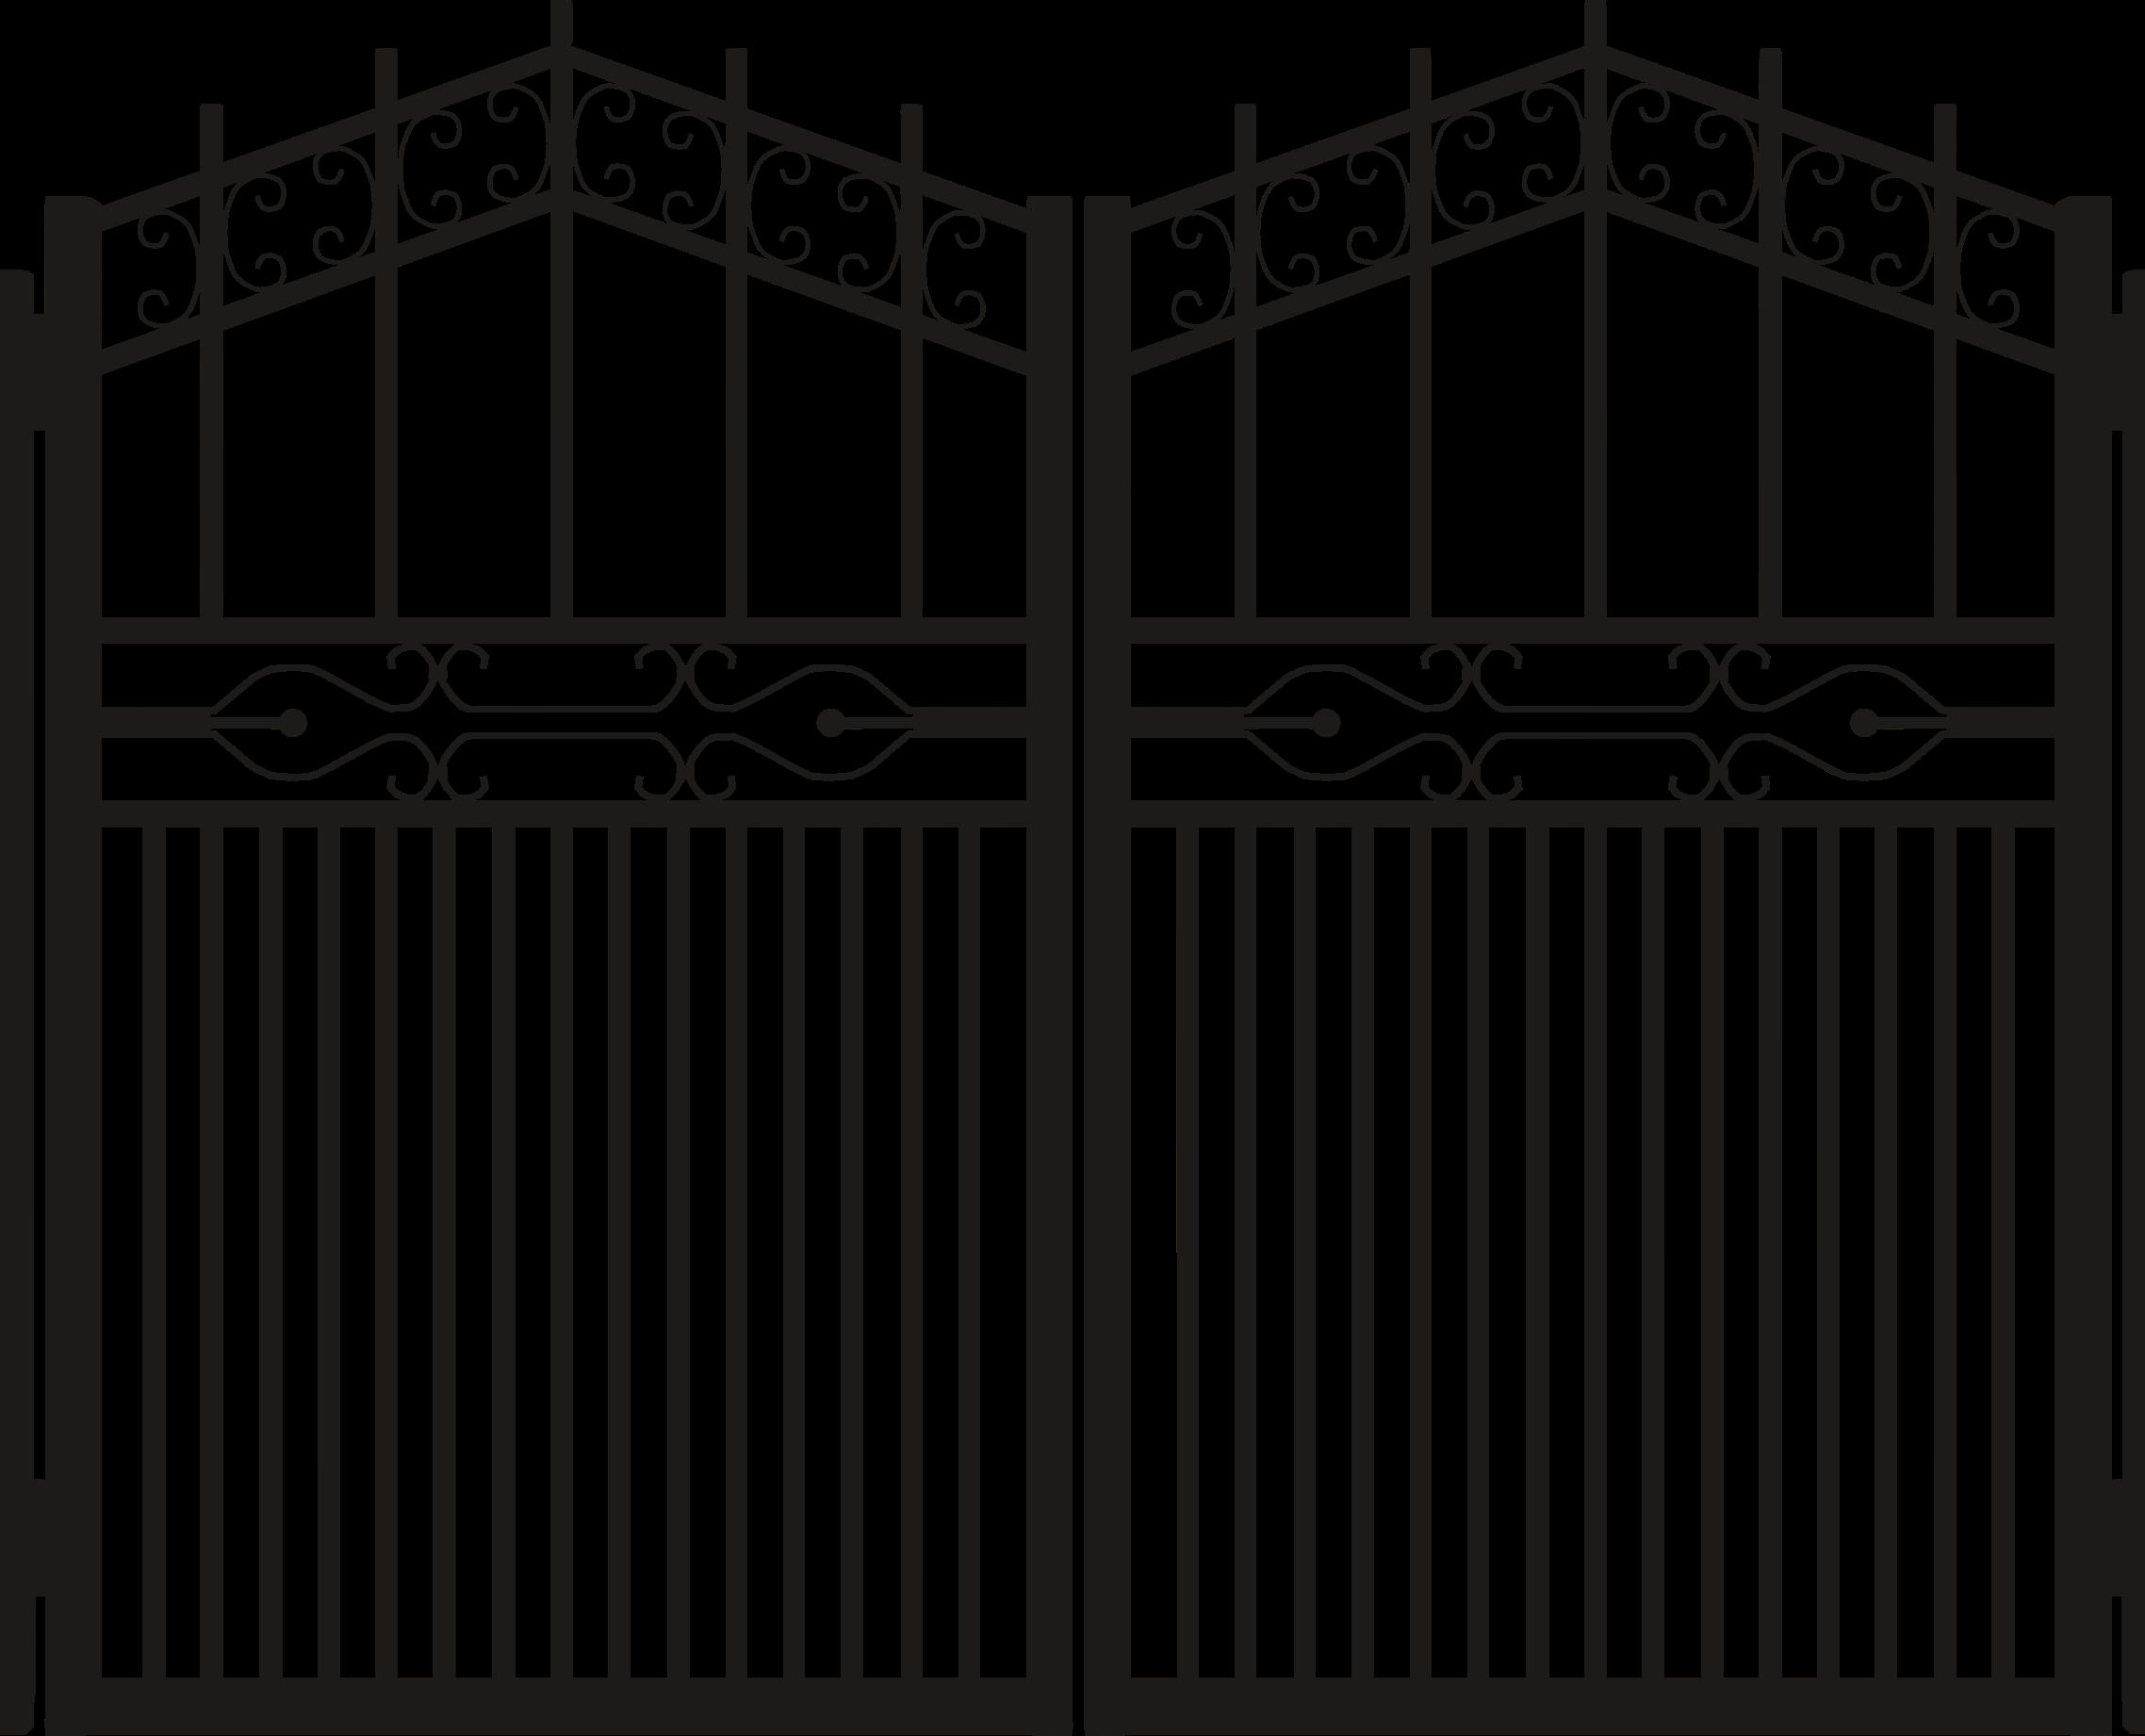 Iron gate silhouette clipart.